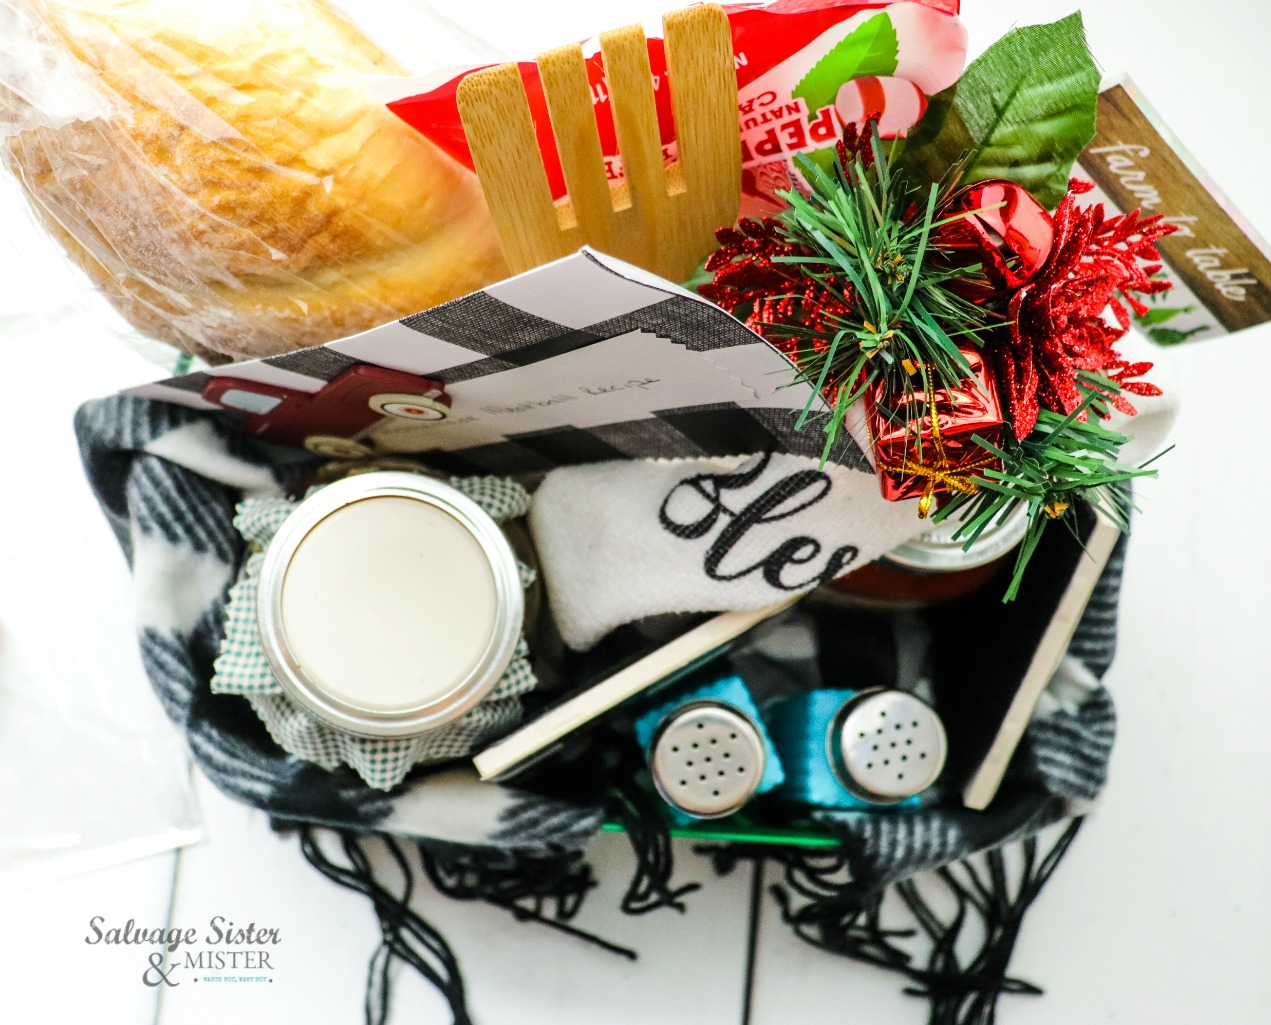 GIFT IDEA - Italian Dinner Gift Basket on salvagesisterandmister.com